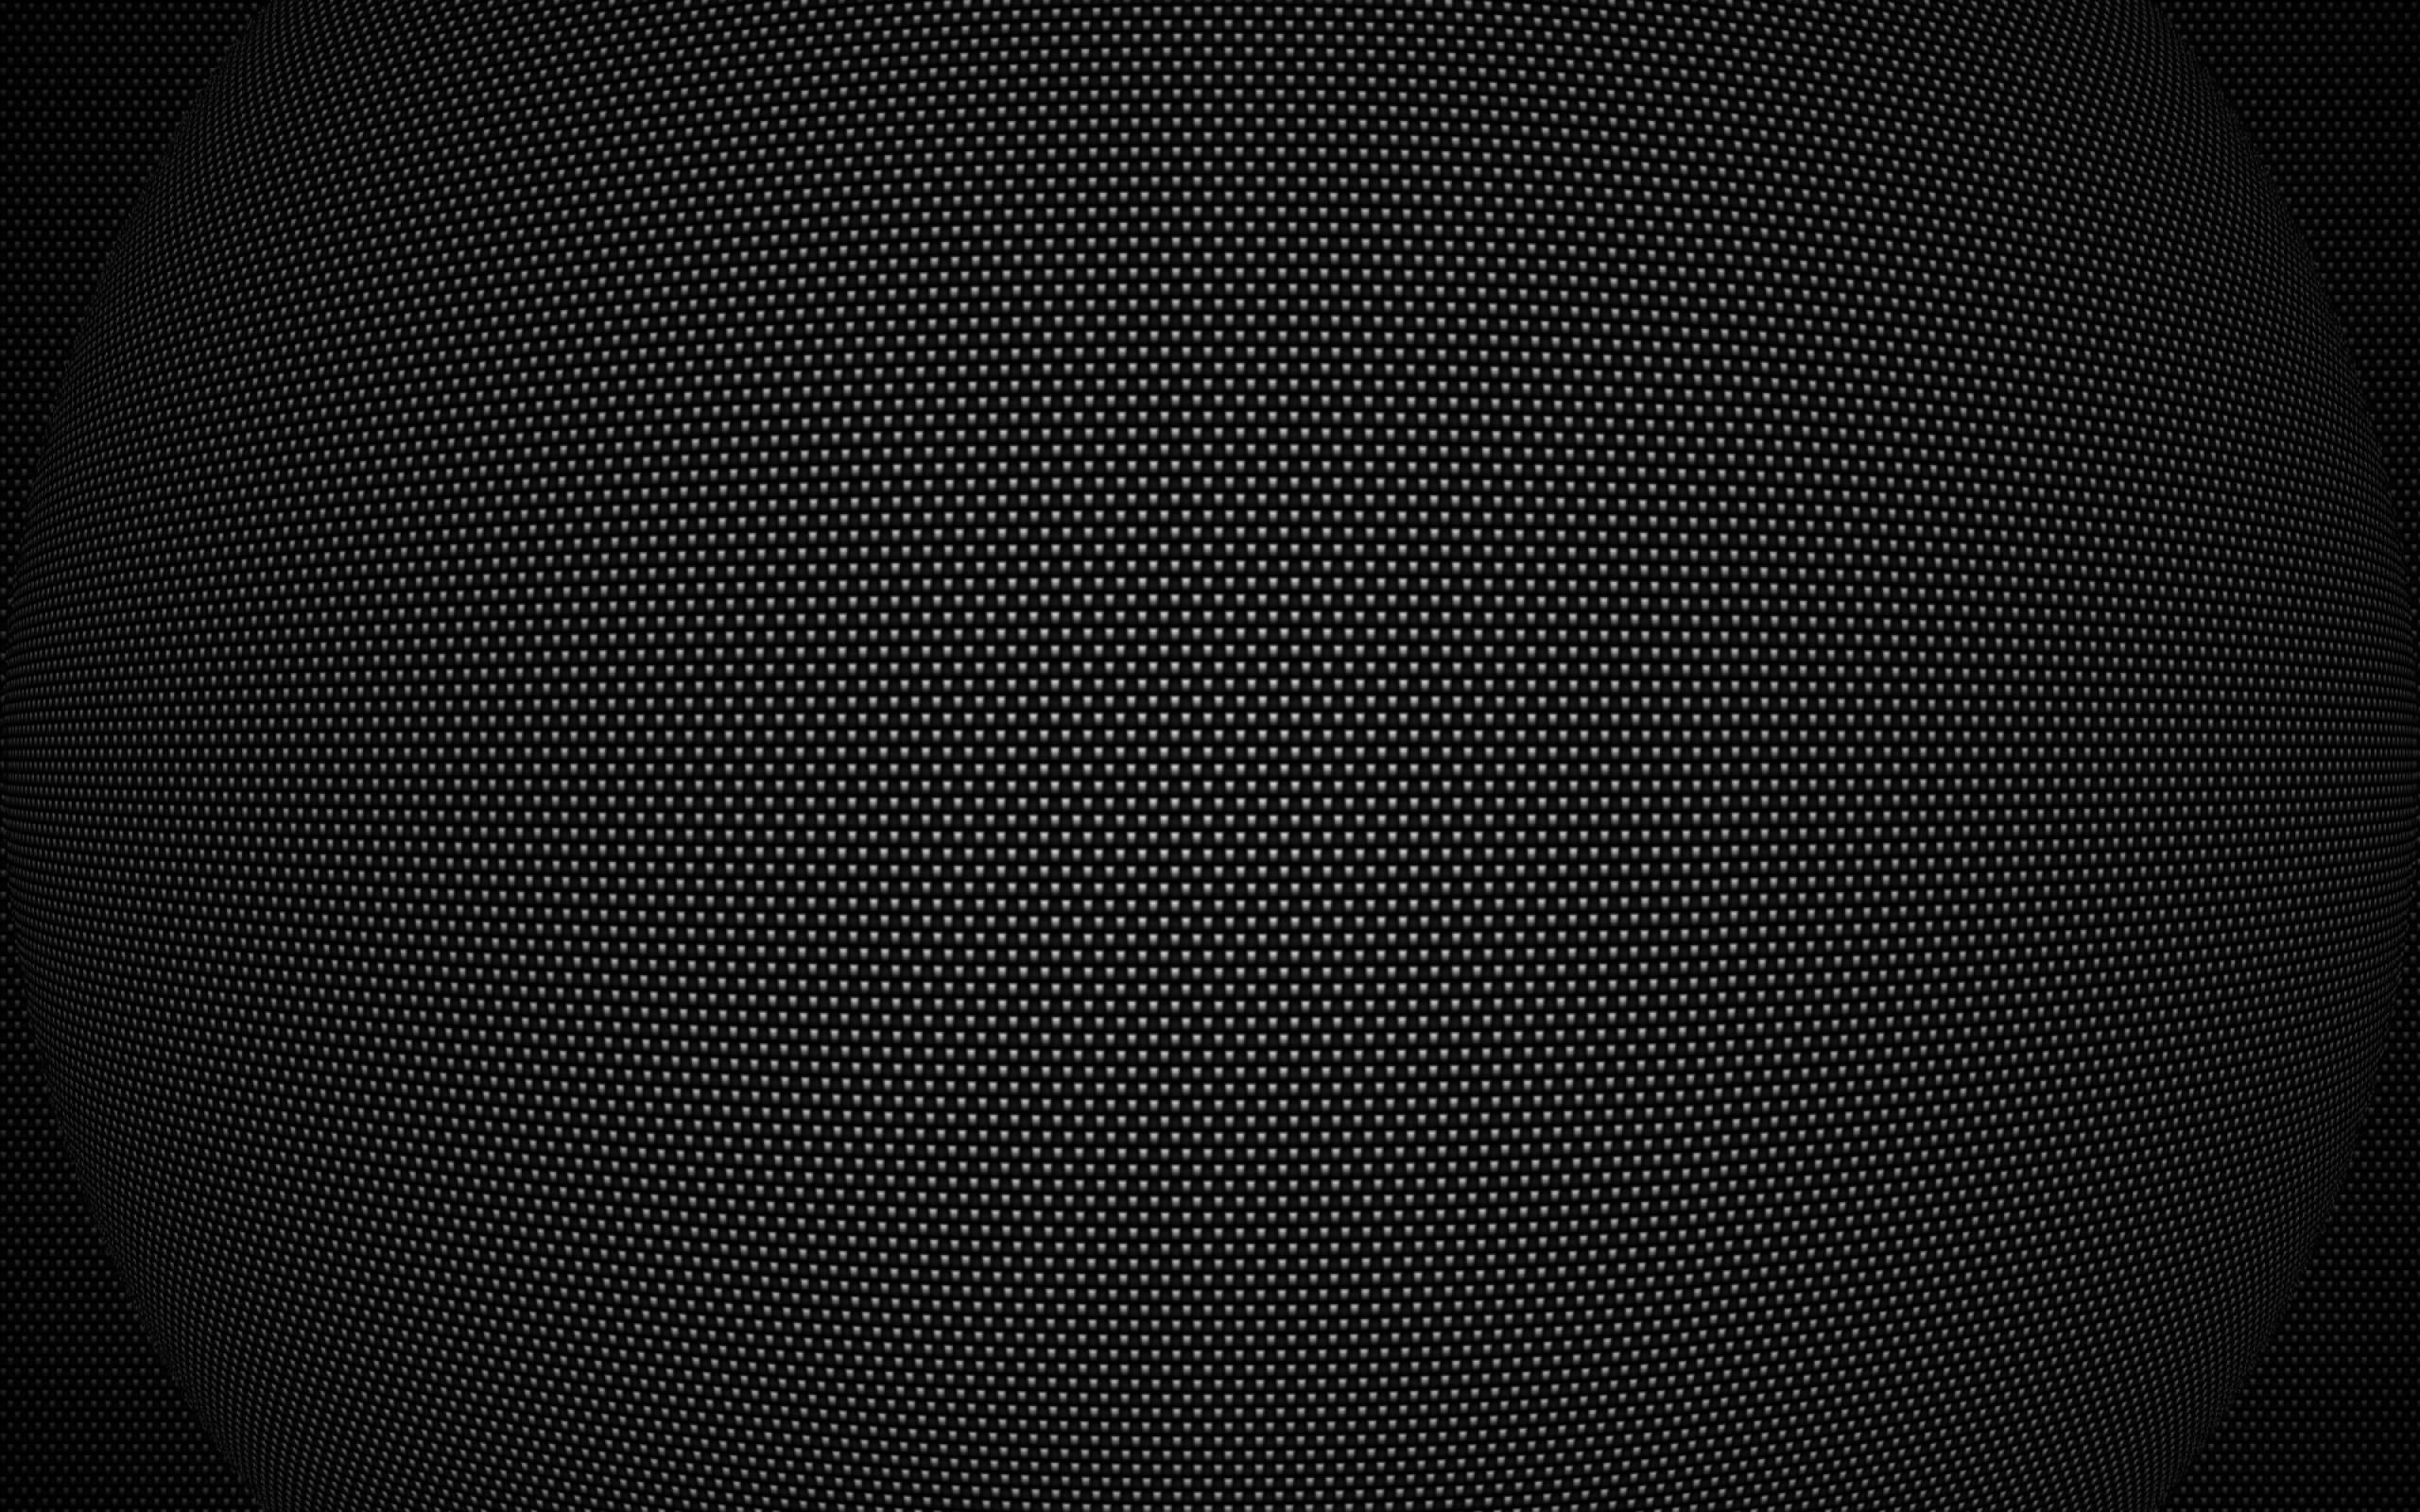 black texture wallpaper hd - photo #13